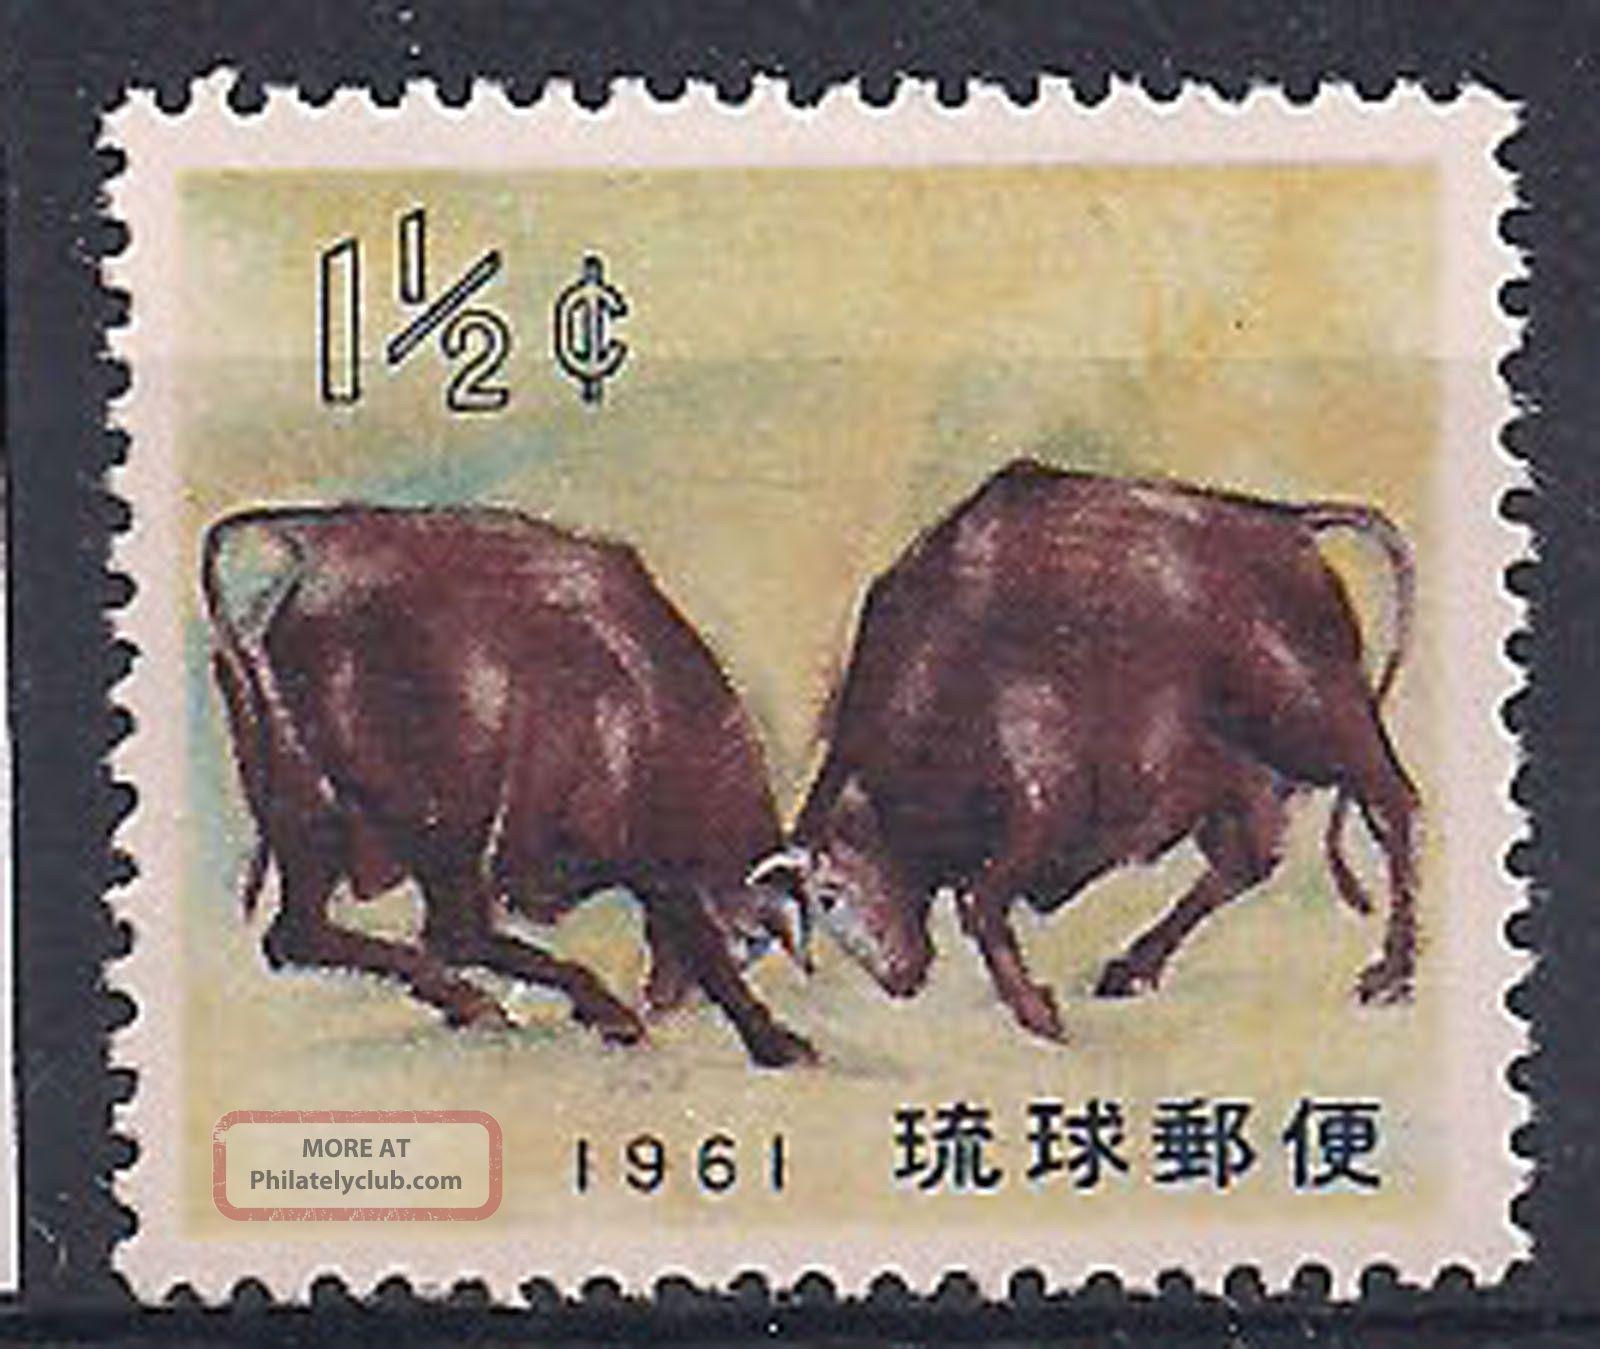 Ryu Kiu - 1960 Wild Animal Mlh - Vf 101 Animal Kingdom photo